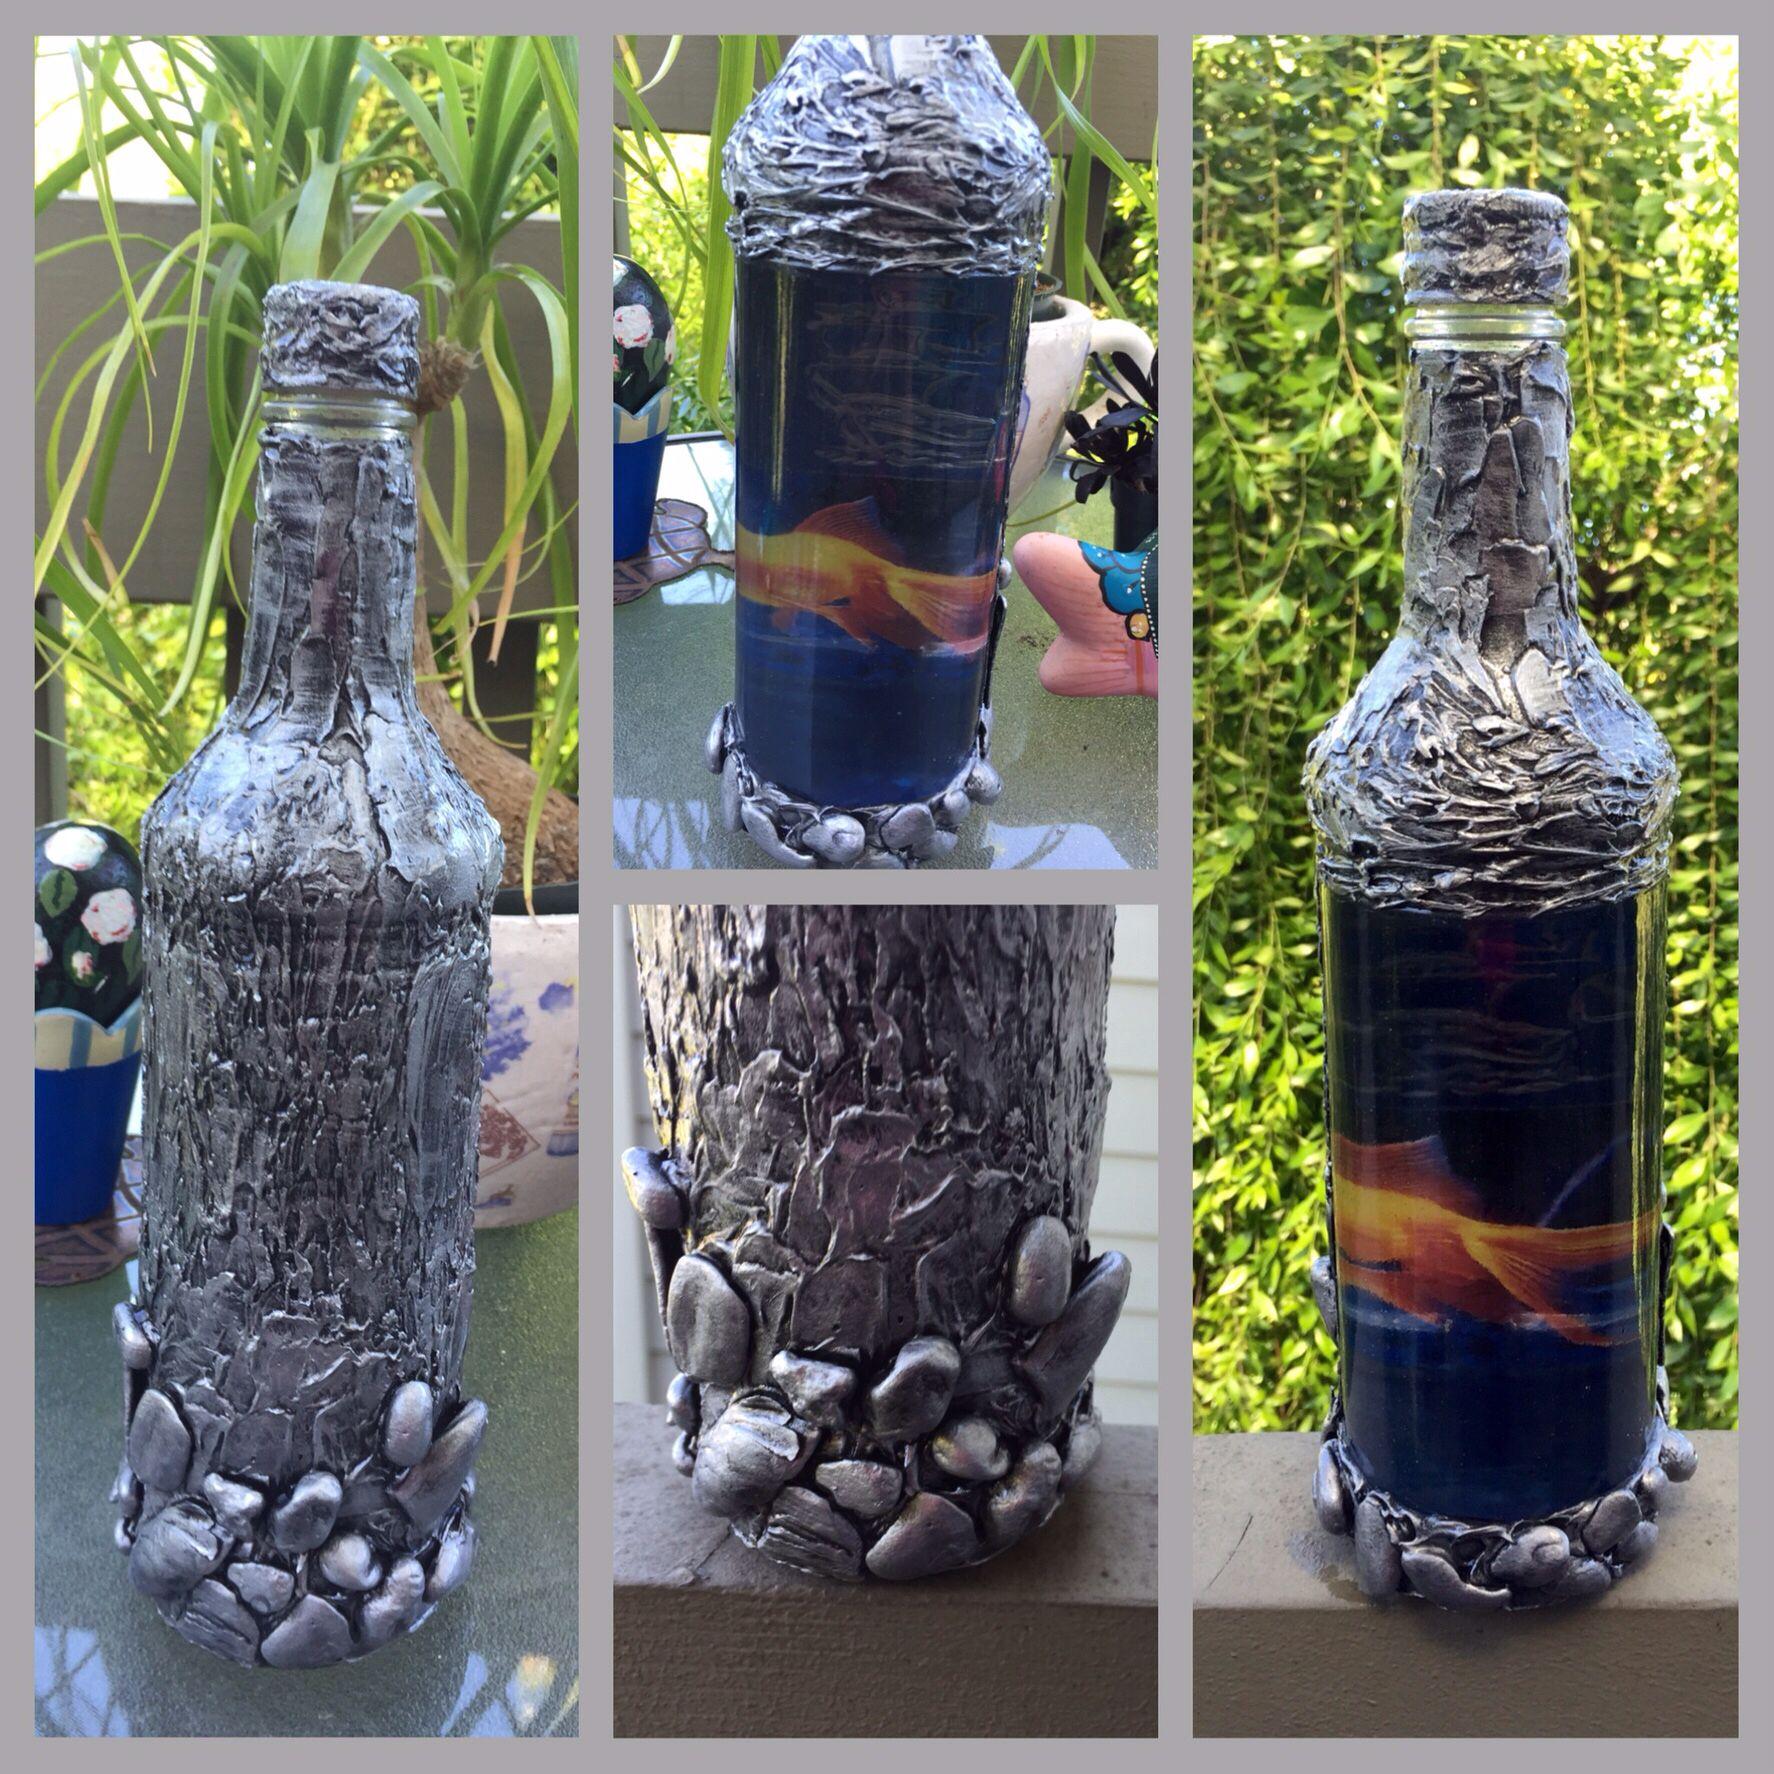 Natalya Vernikova Decoupage Bottle Created By Me Gold Fish, Reverse